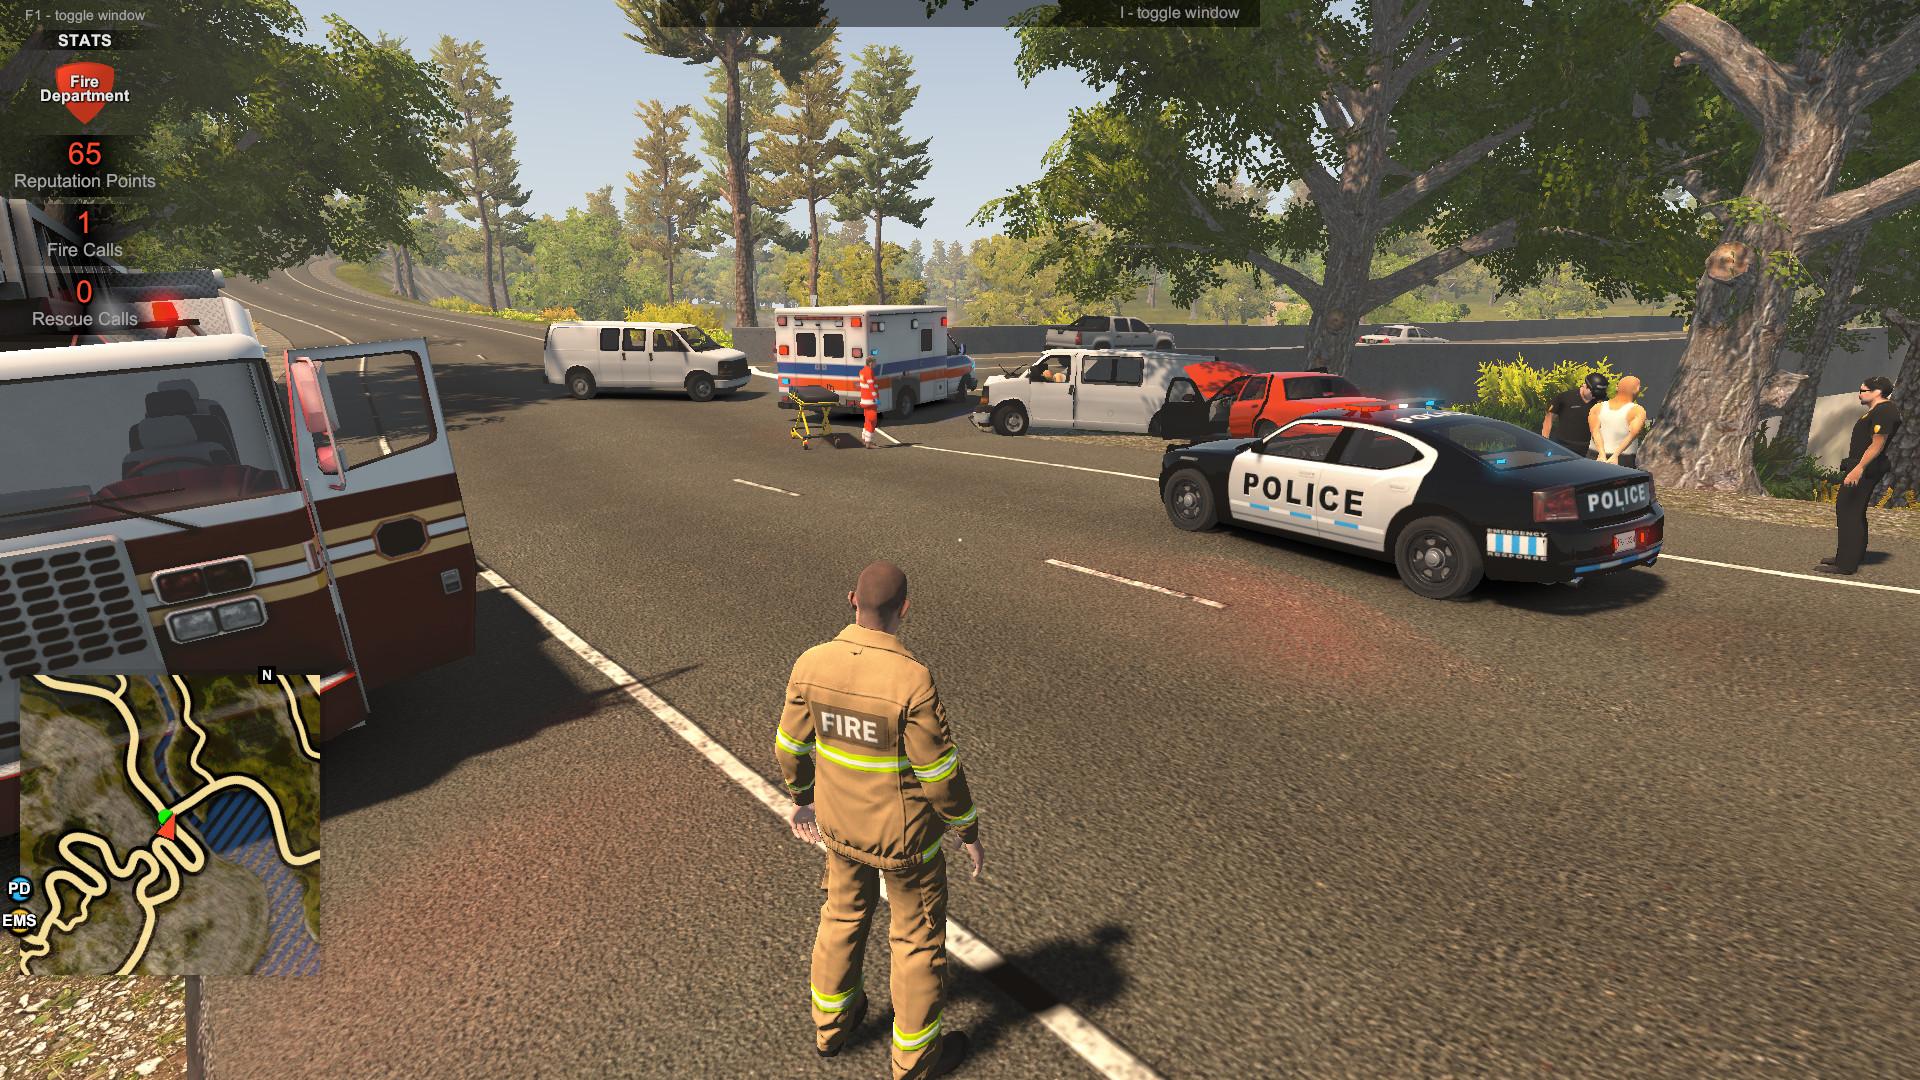 ⛔ Police simulator 18 pc download ocean of games | Police